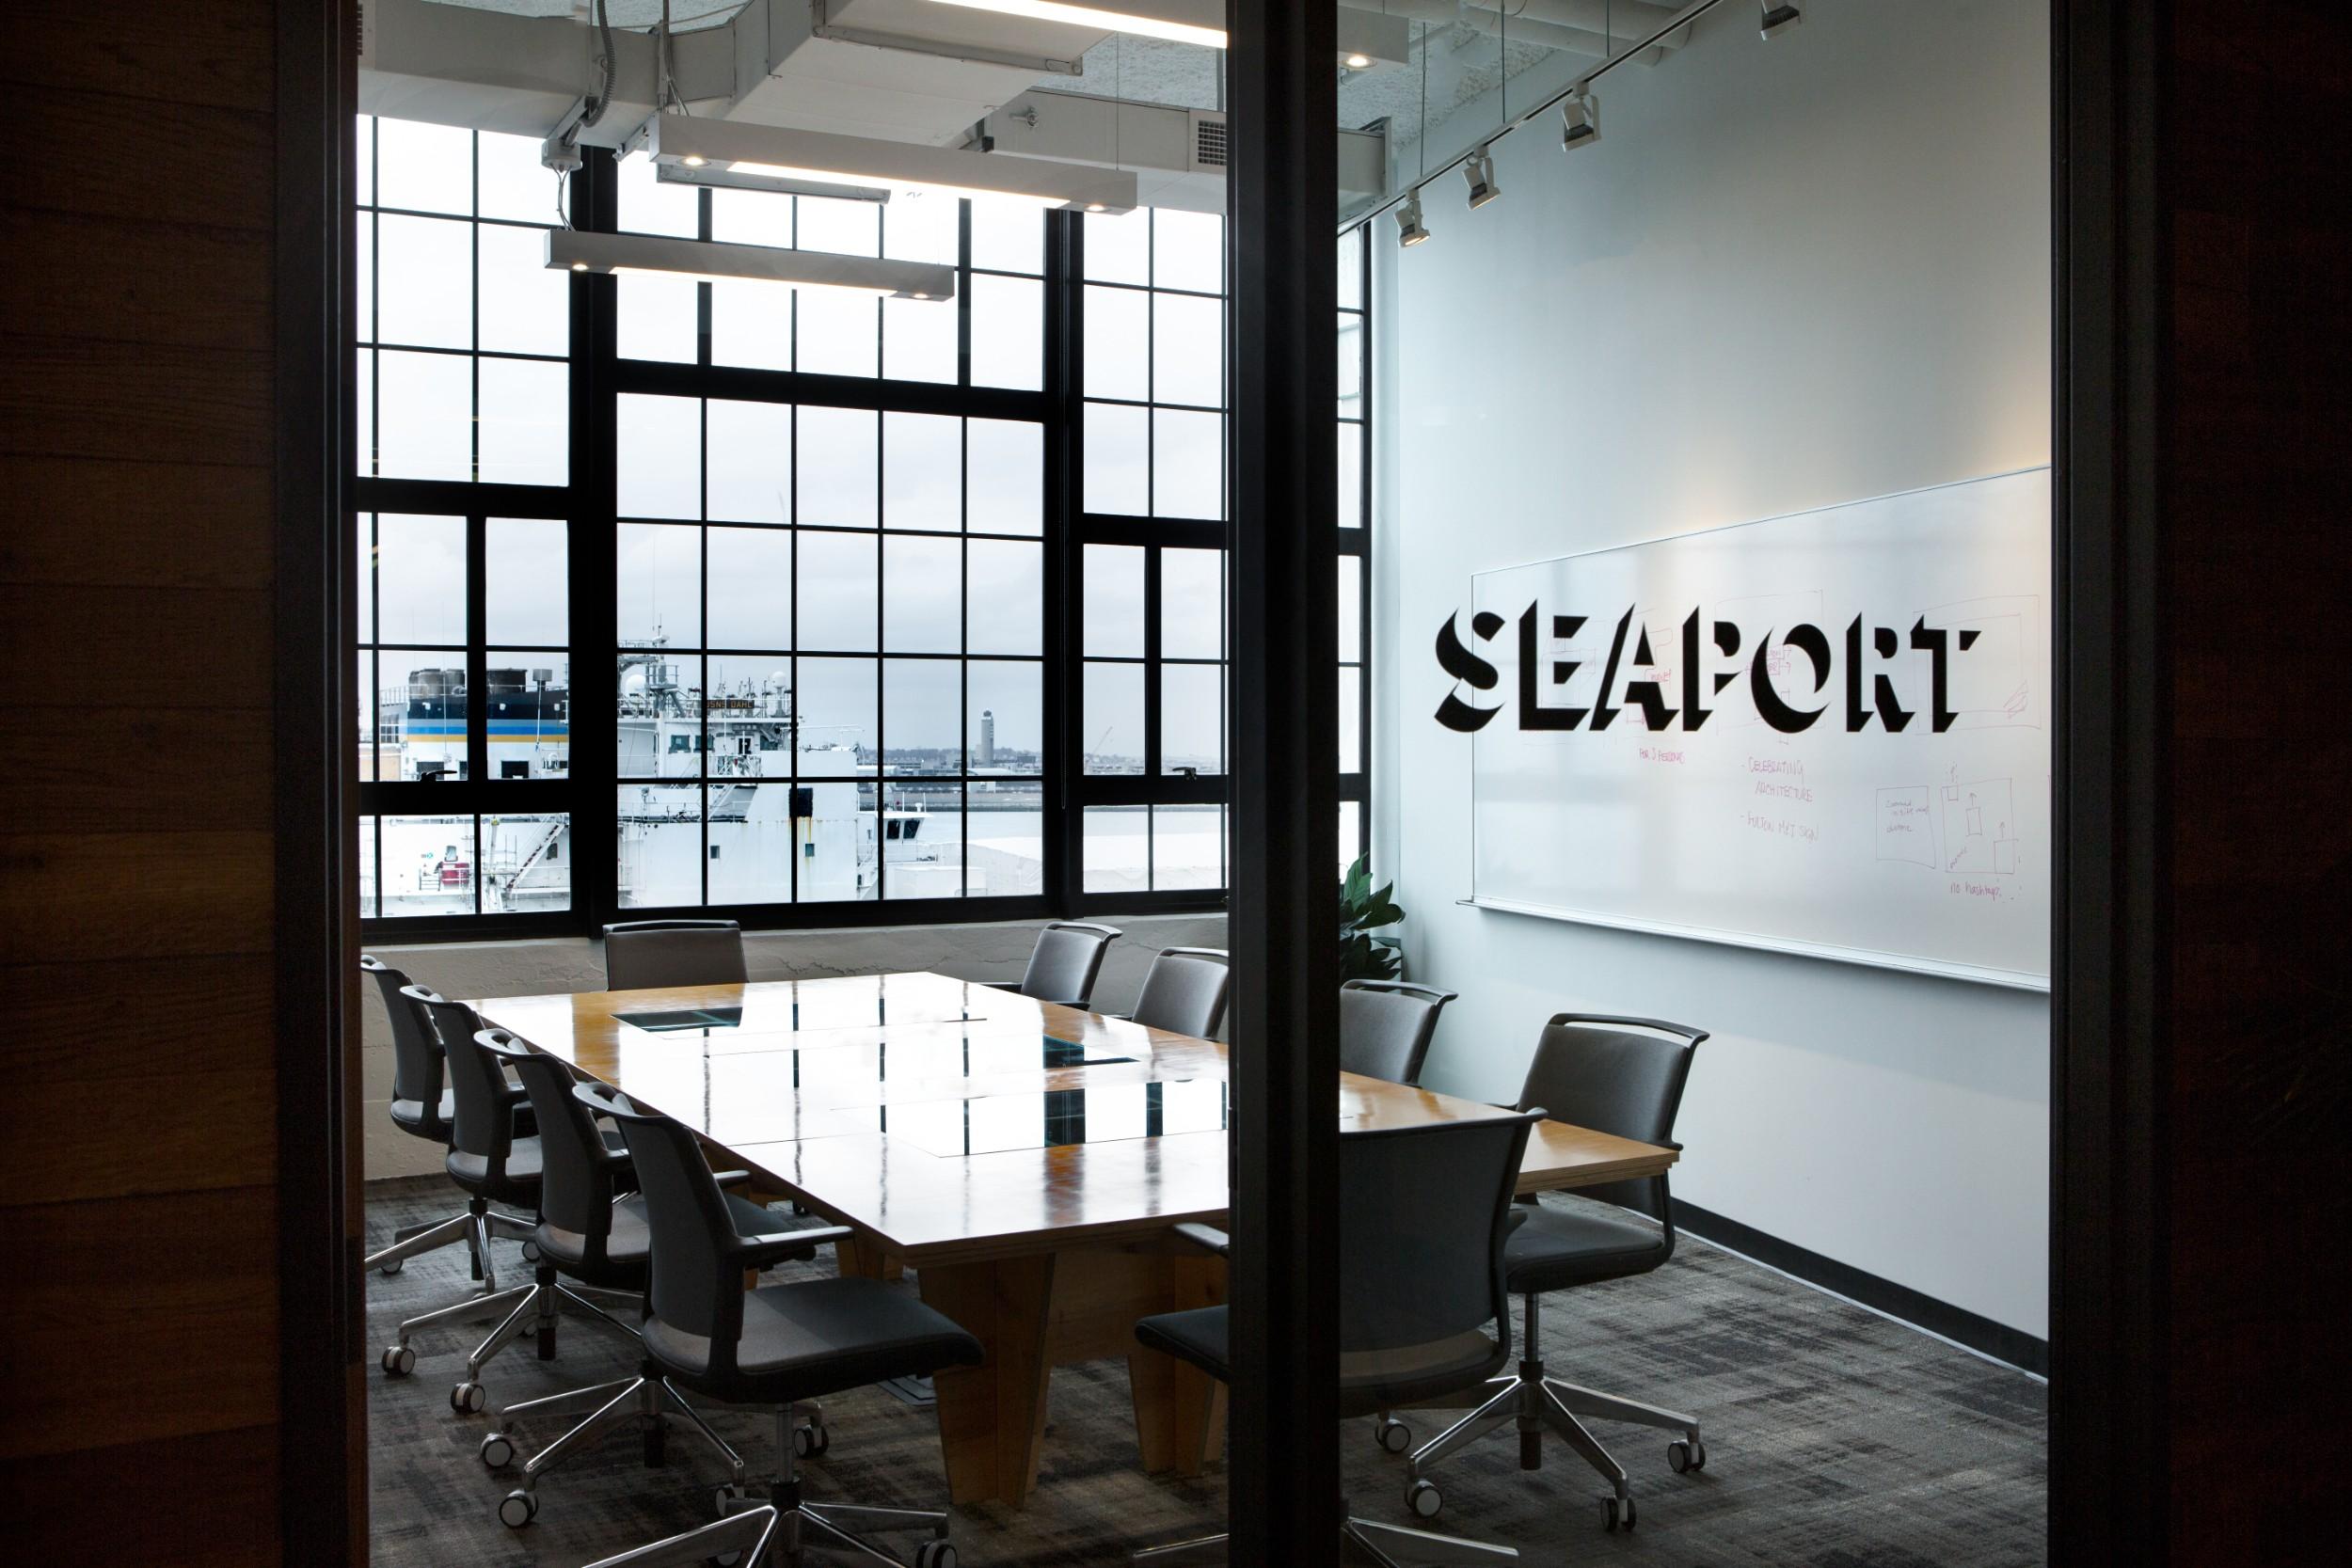 Corderman_Company_Construction_Neoscape_Office_Design_Seaport_Boston_Meeting_Room_2.jpg